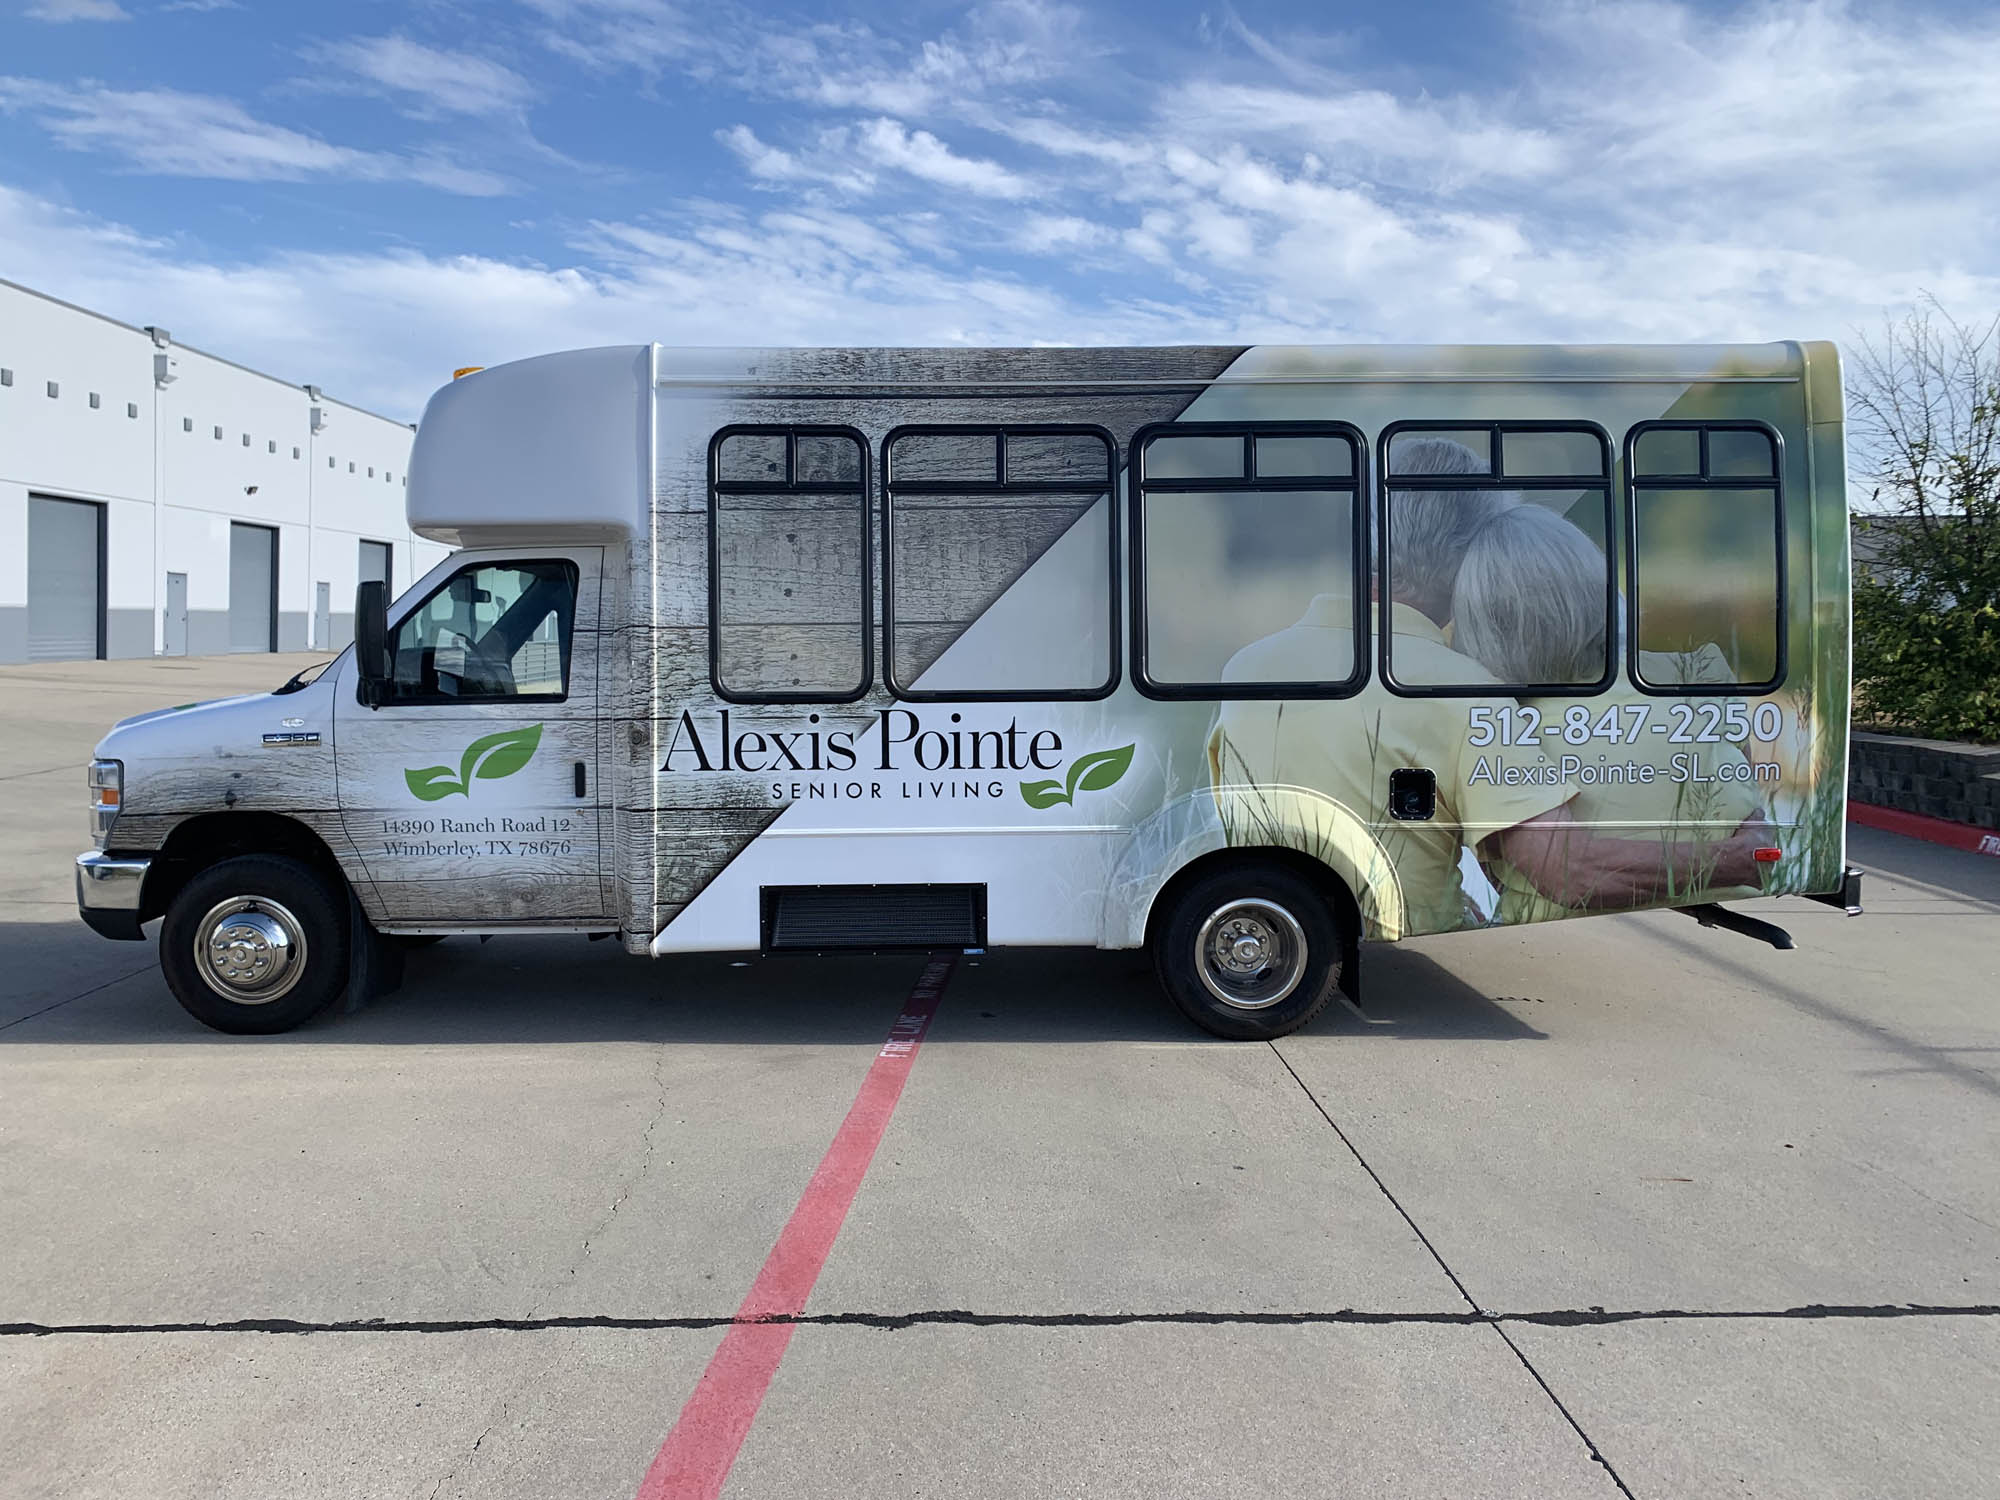 Alexis Pointe Passenger Bus Wrap